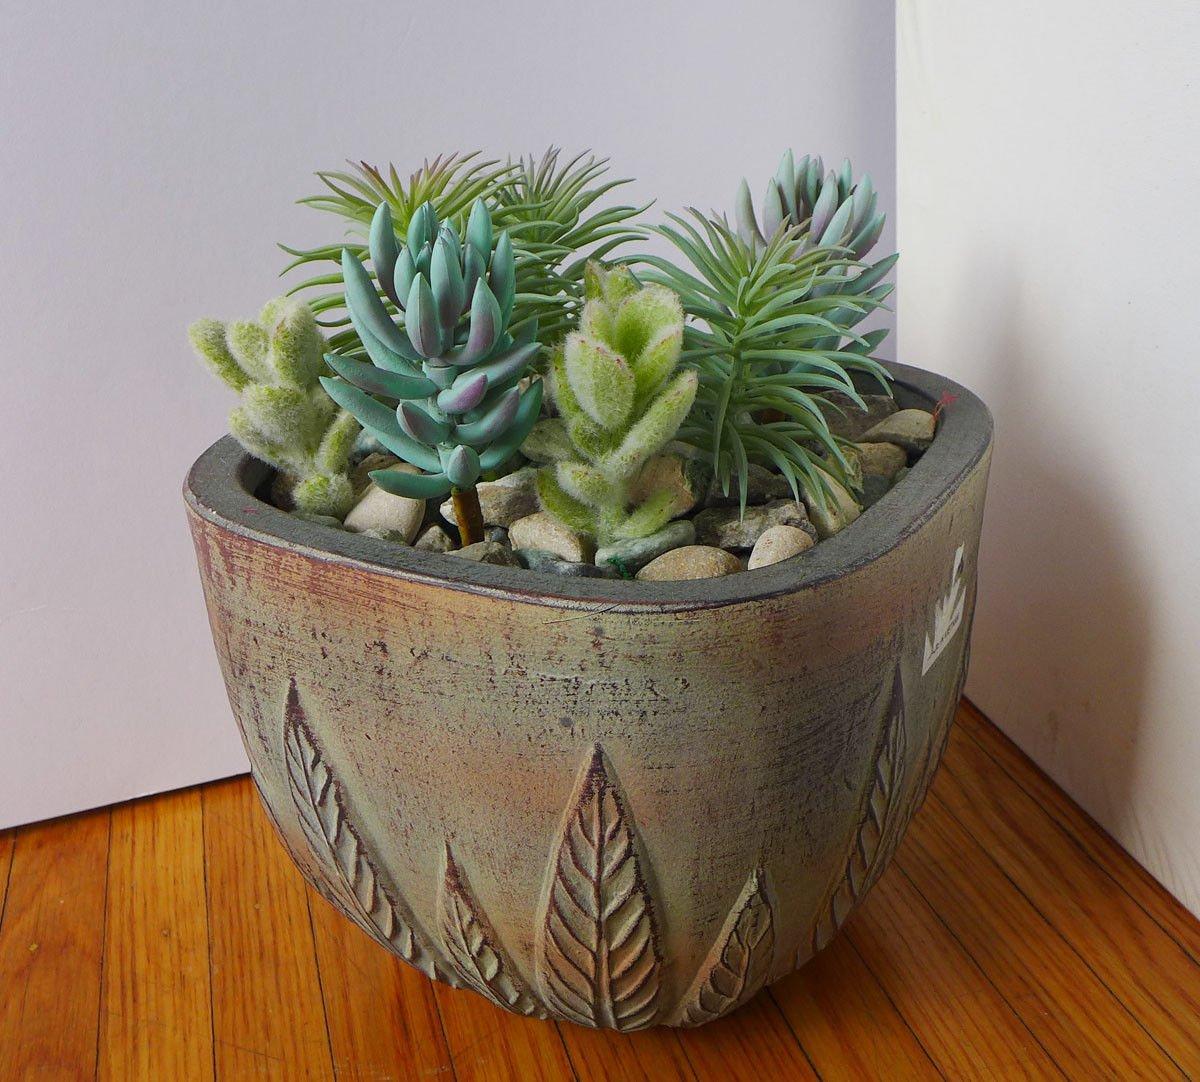 Set of 8 Mini Artificial Plants Grass Yacon Flowering Cactus Succulents